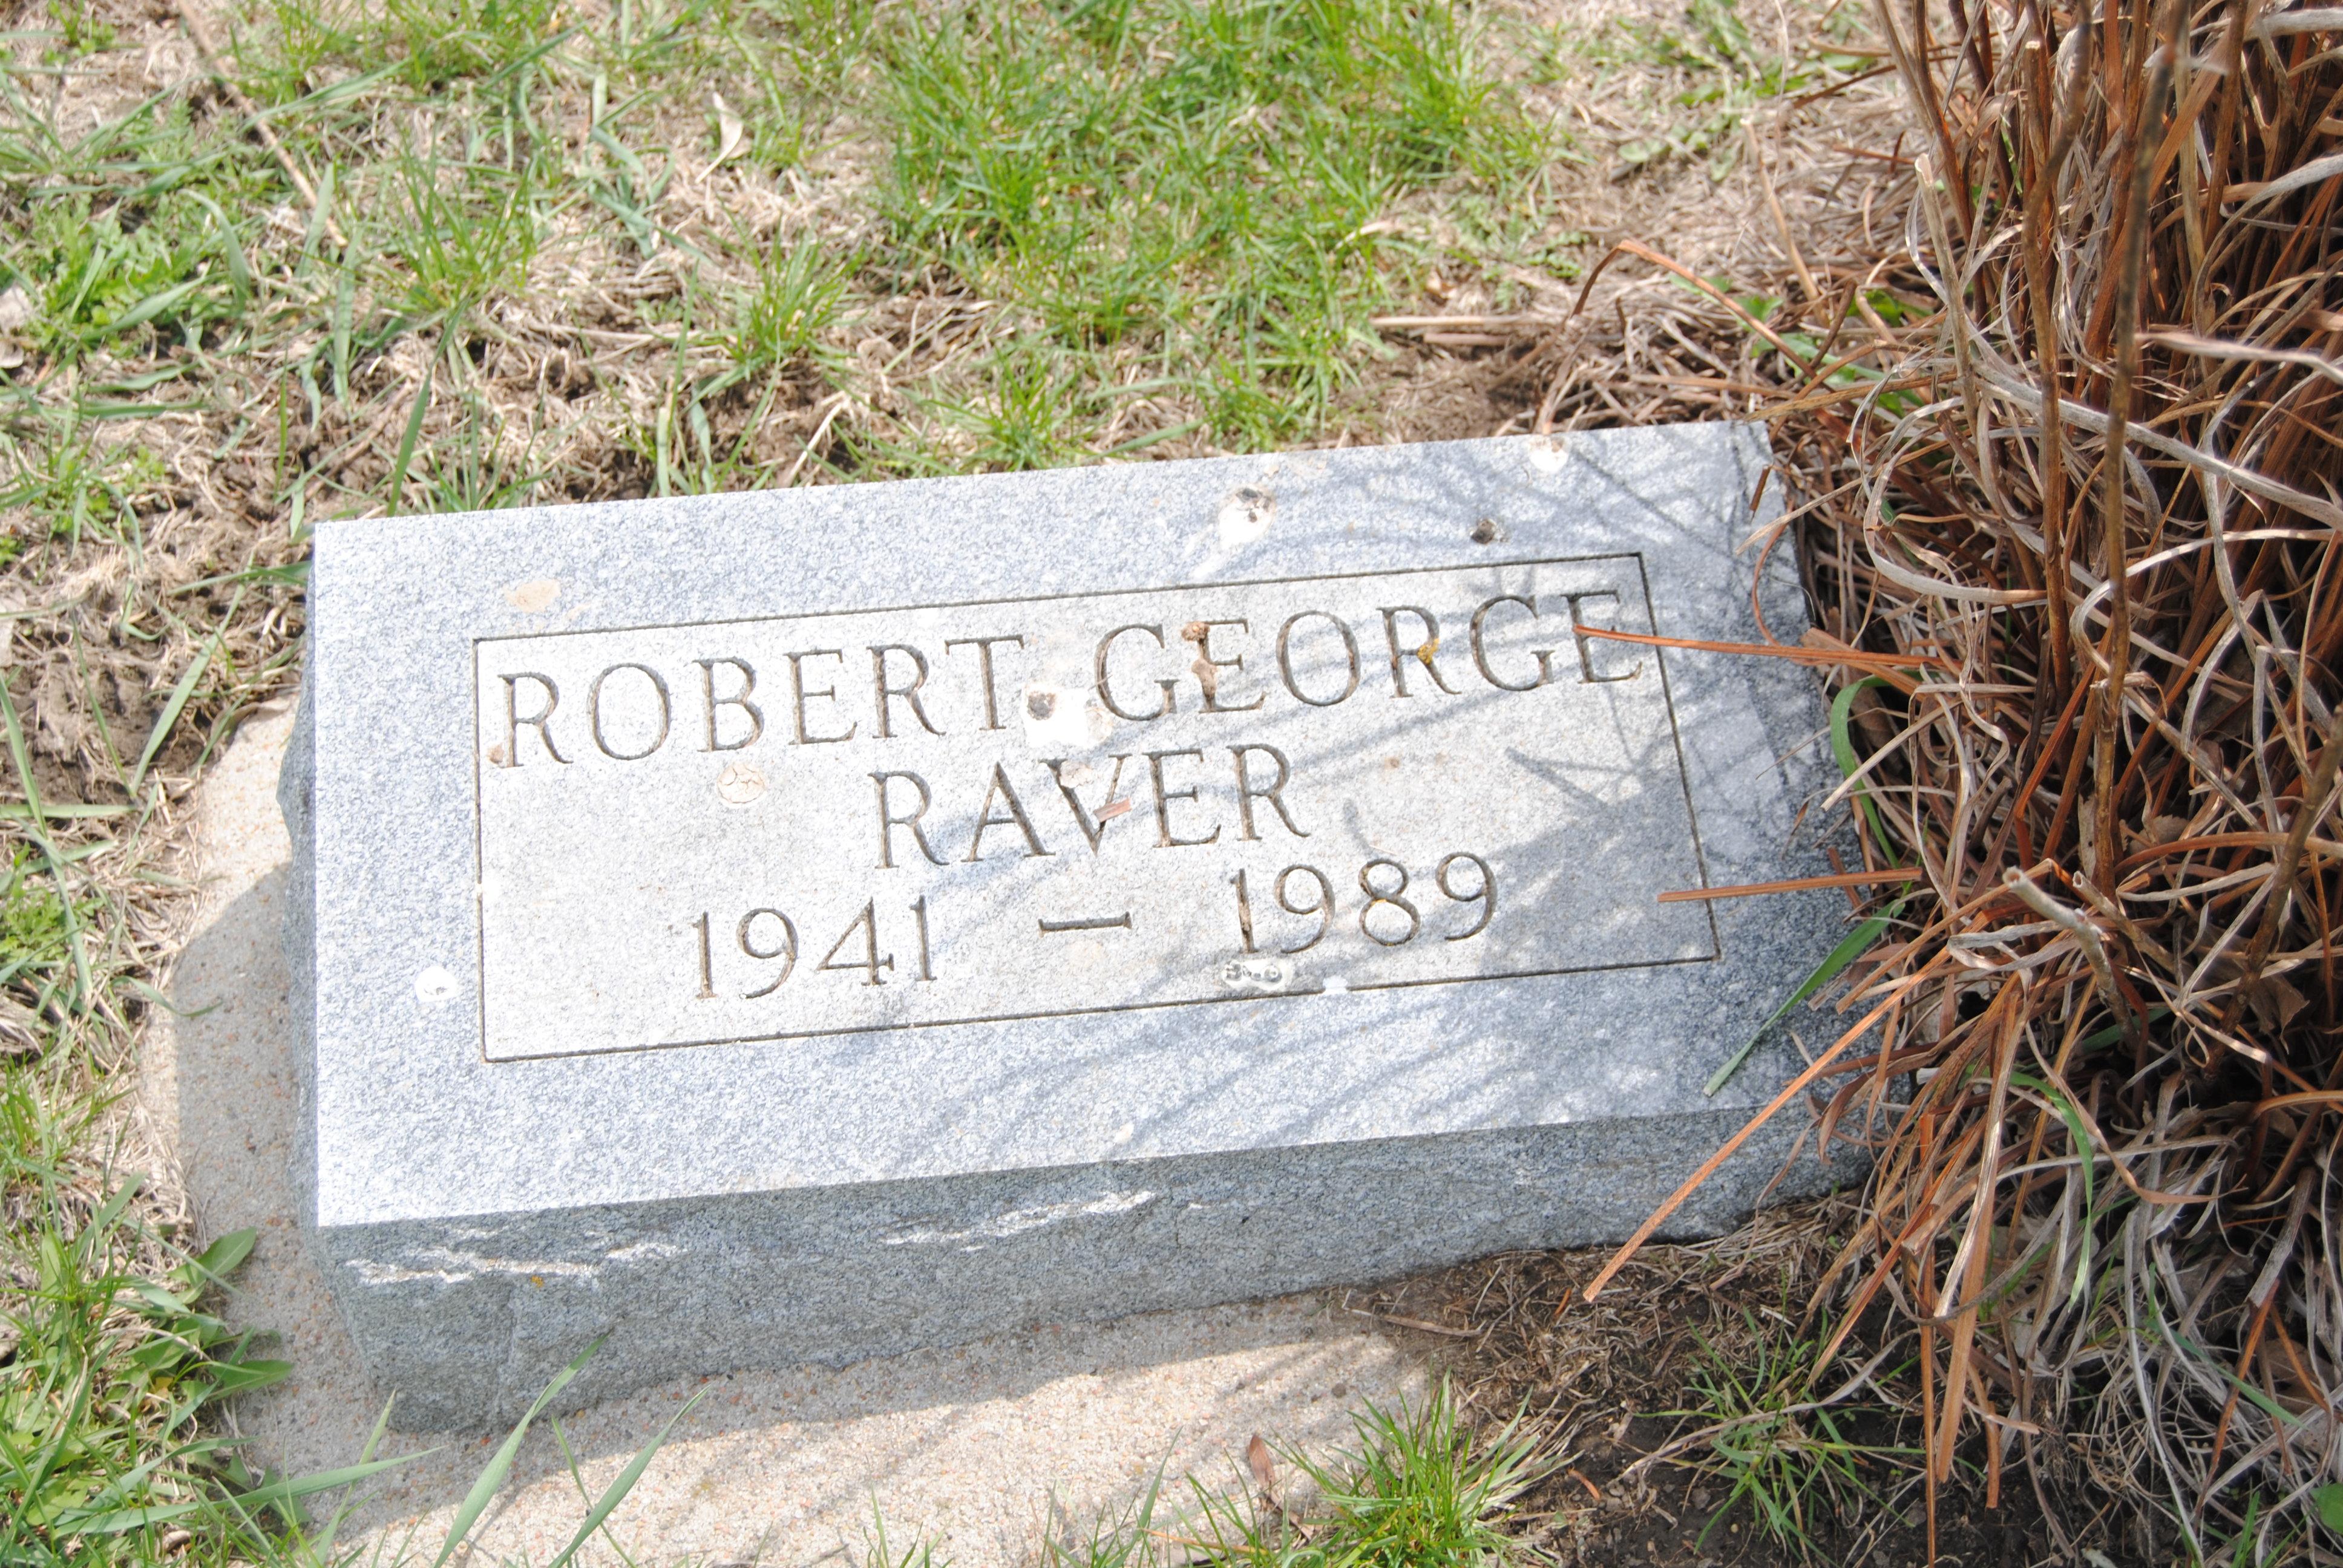 Robert George Bob Raver